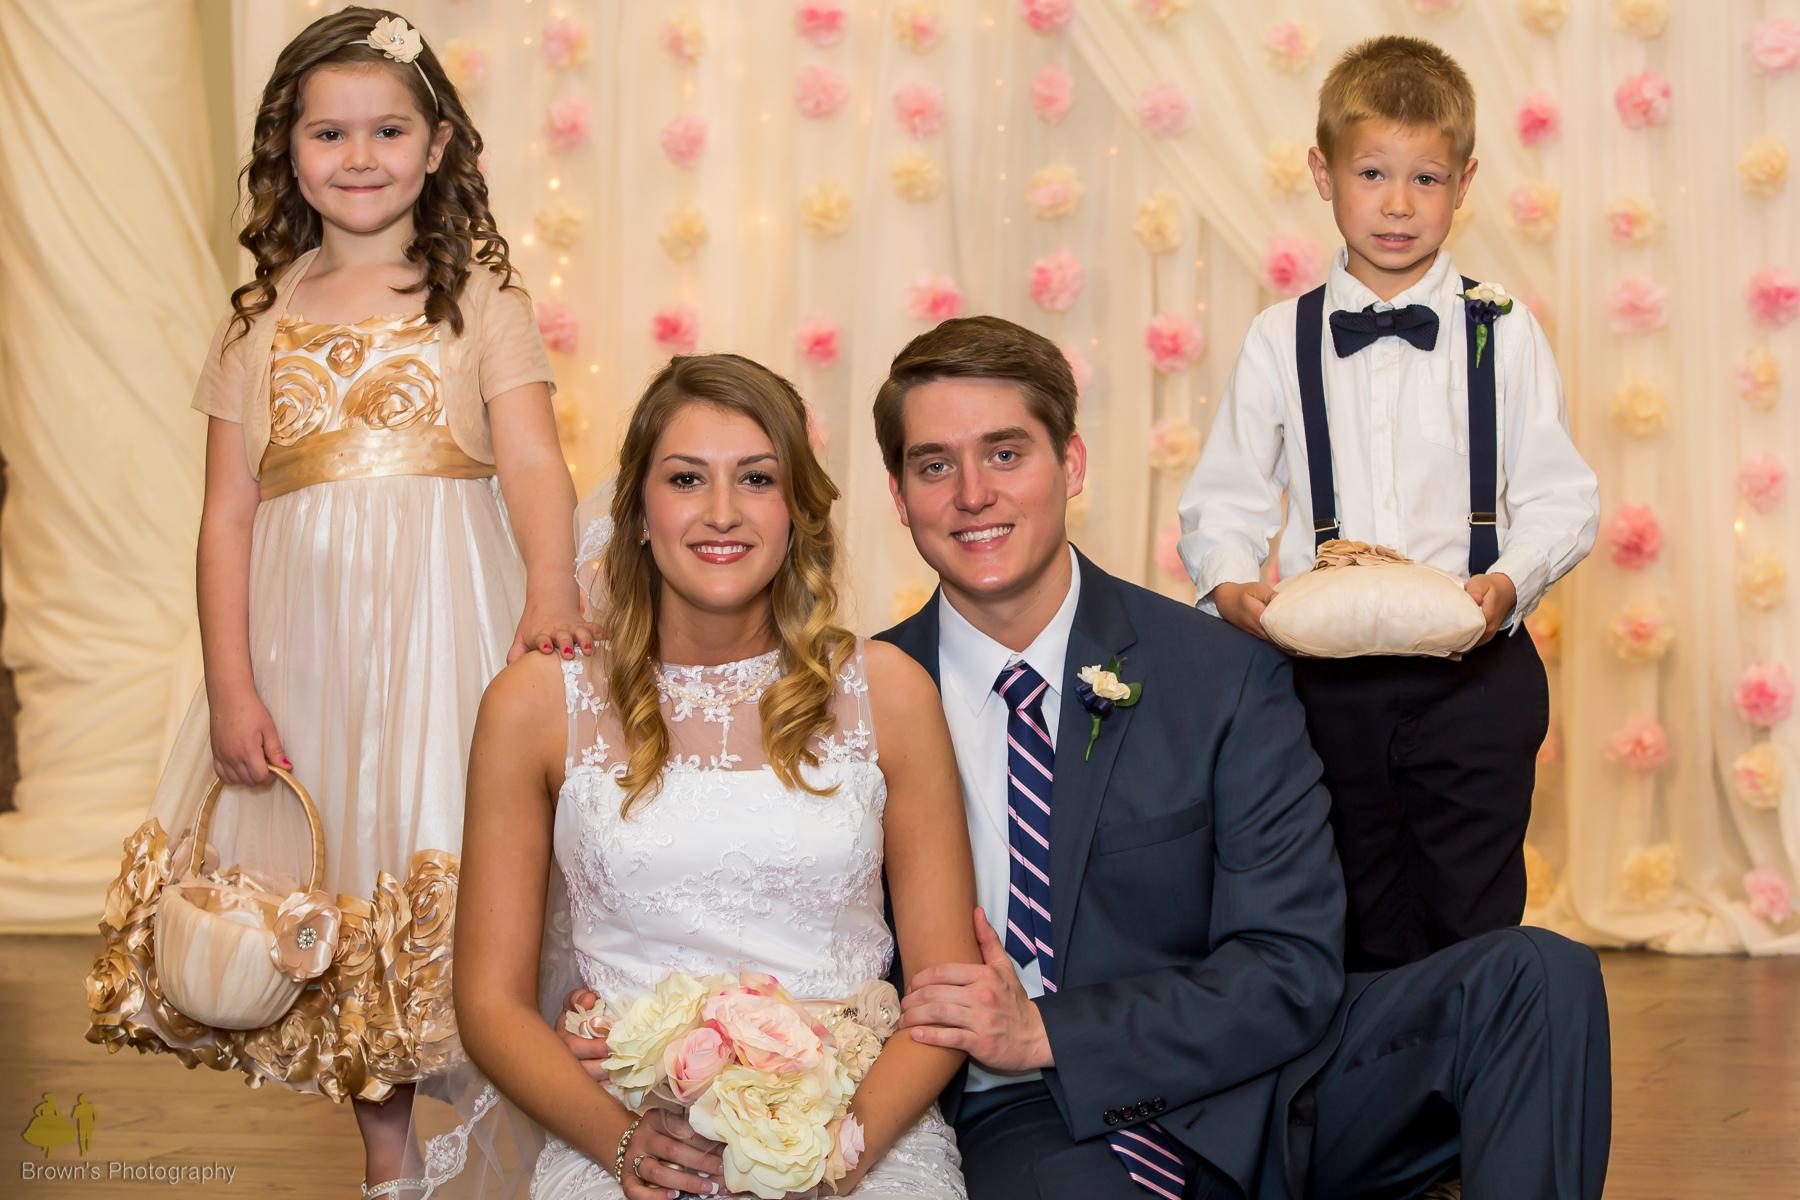 stillwater-wedding-photographer-1-11.jpg